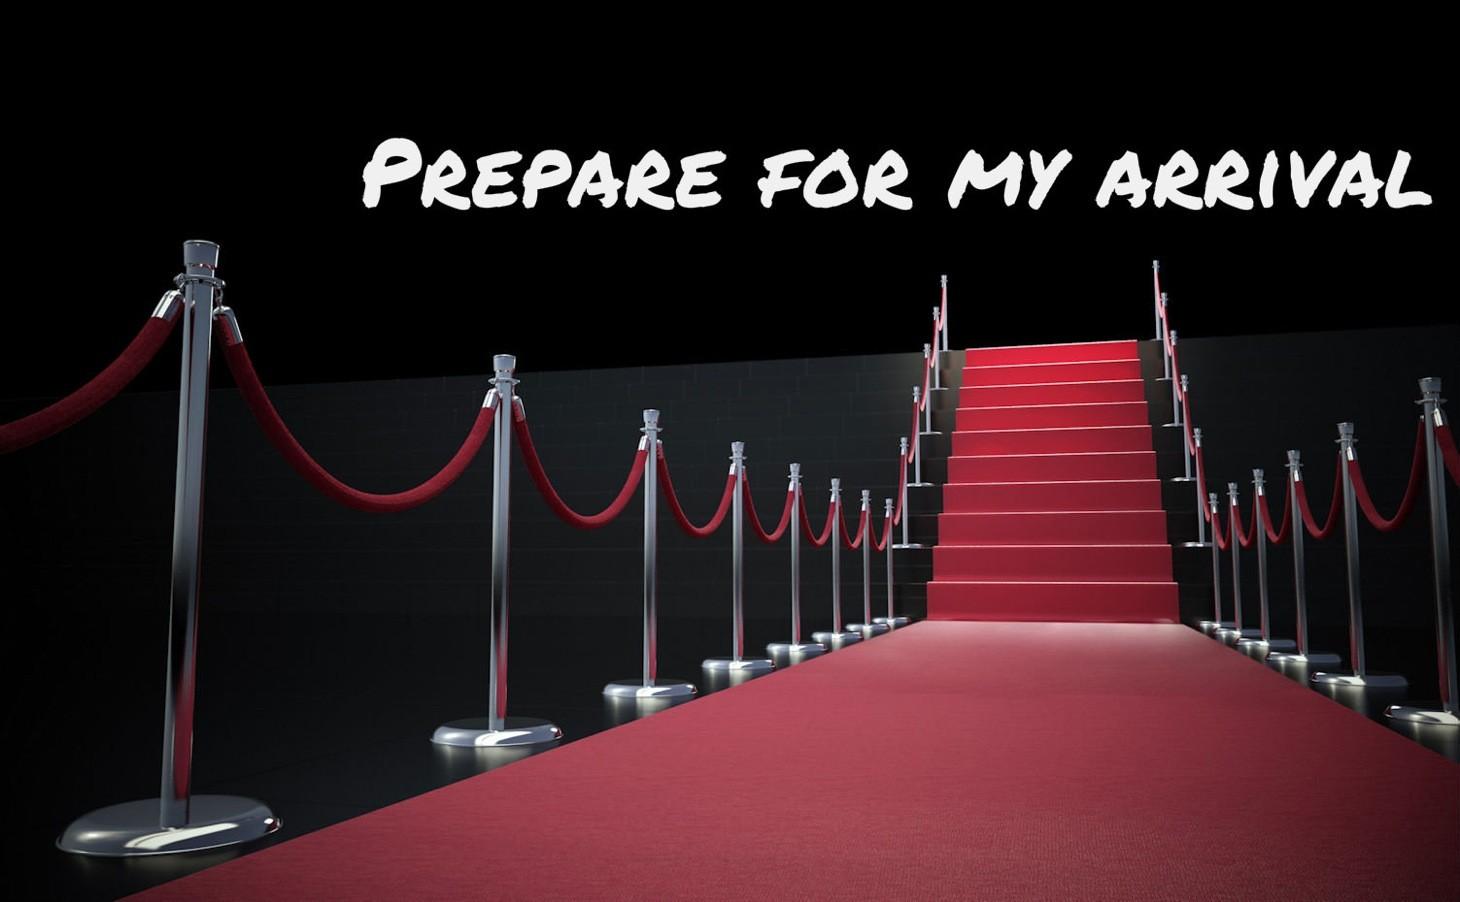 wpid-Red-Carpet-Stairs-stock5830.jpg